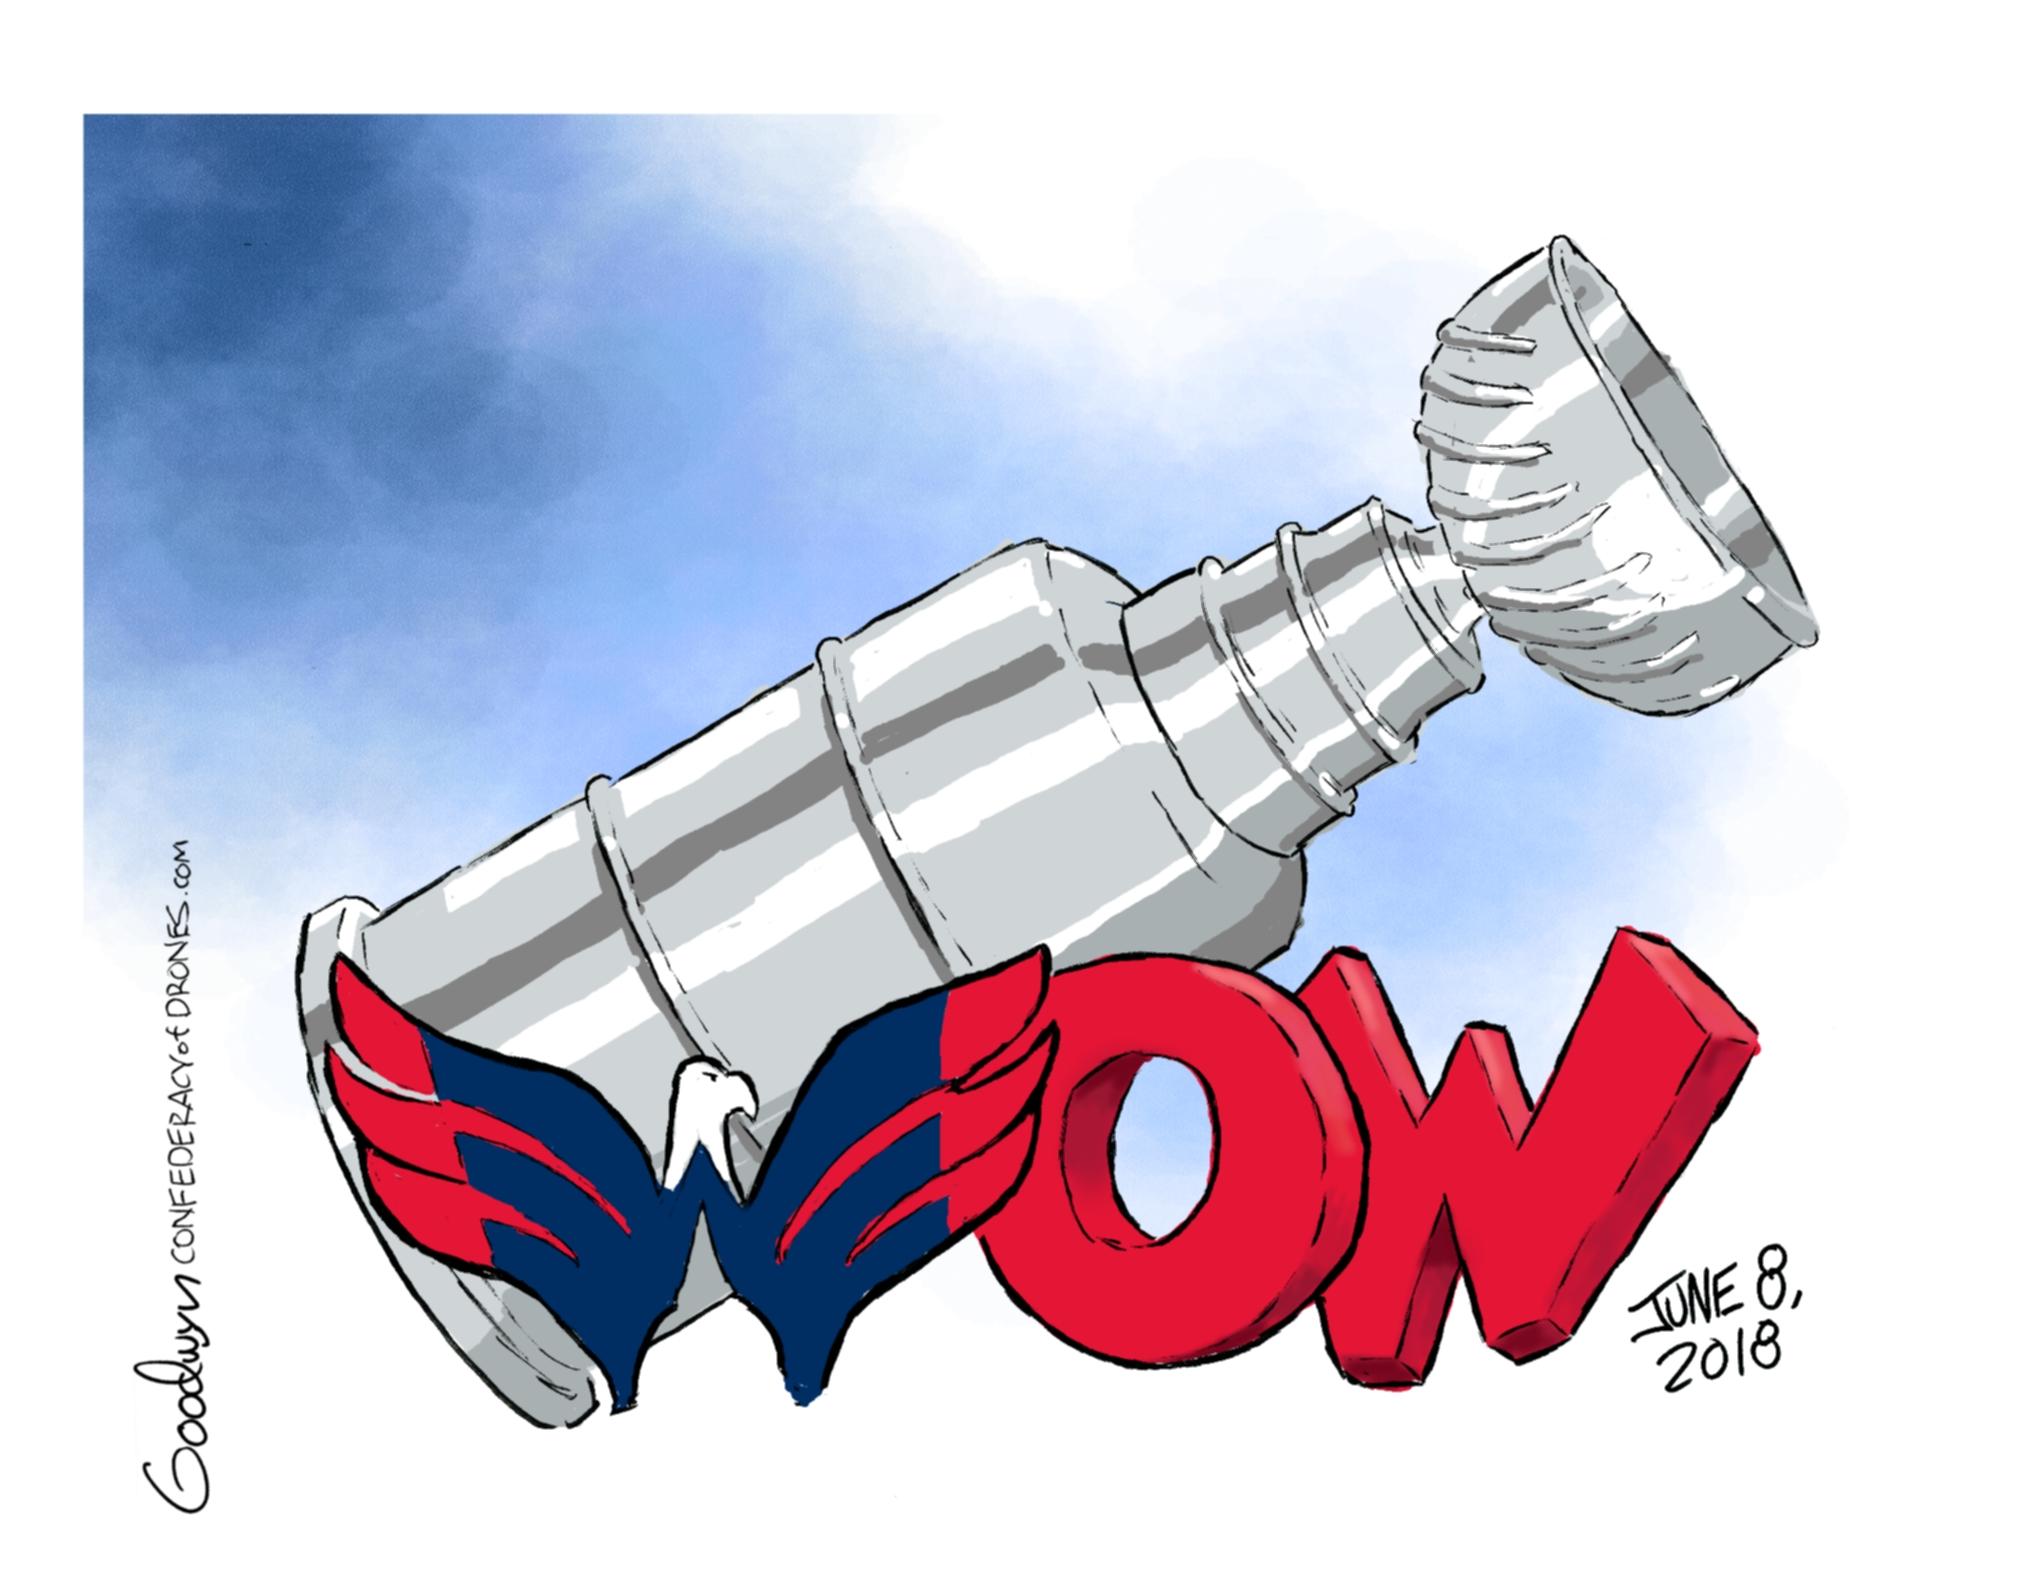 Stanley Cup lr